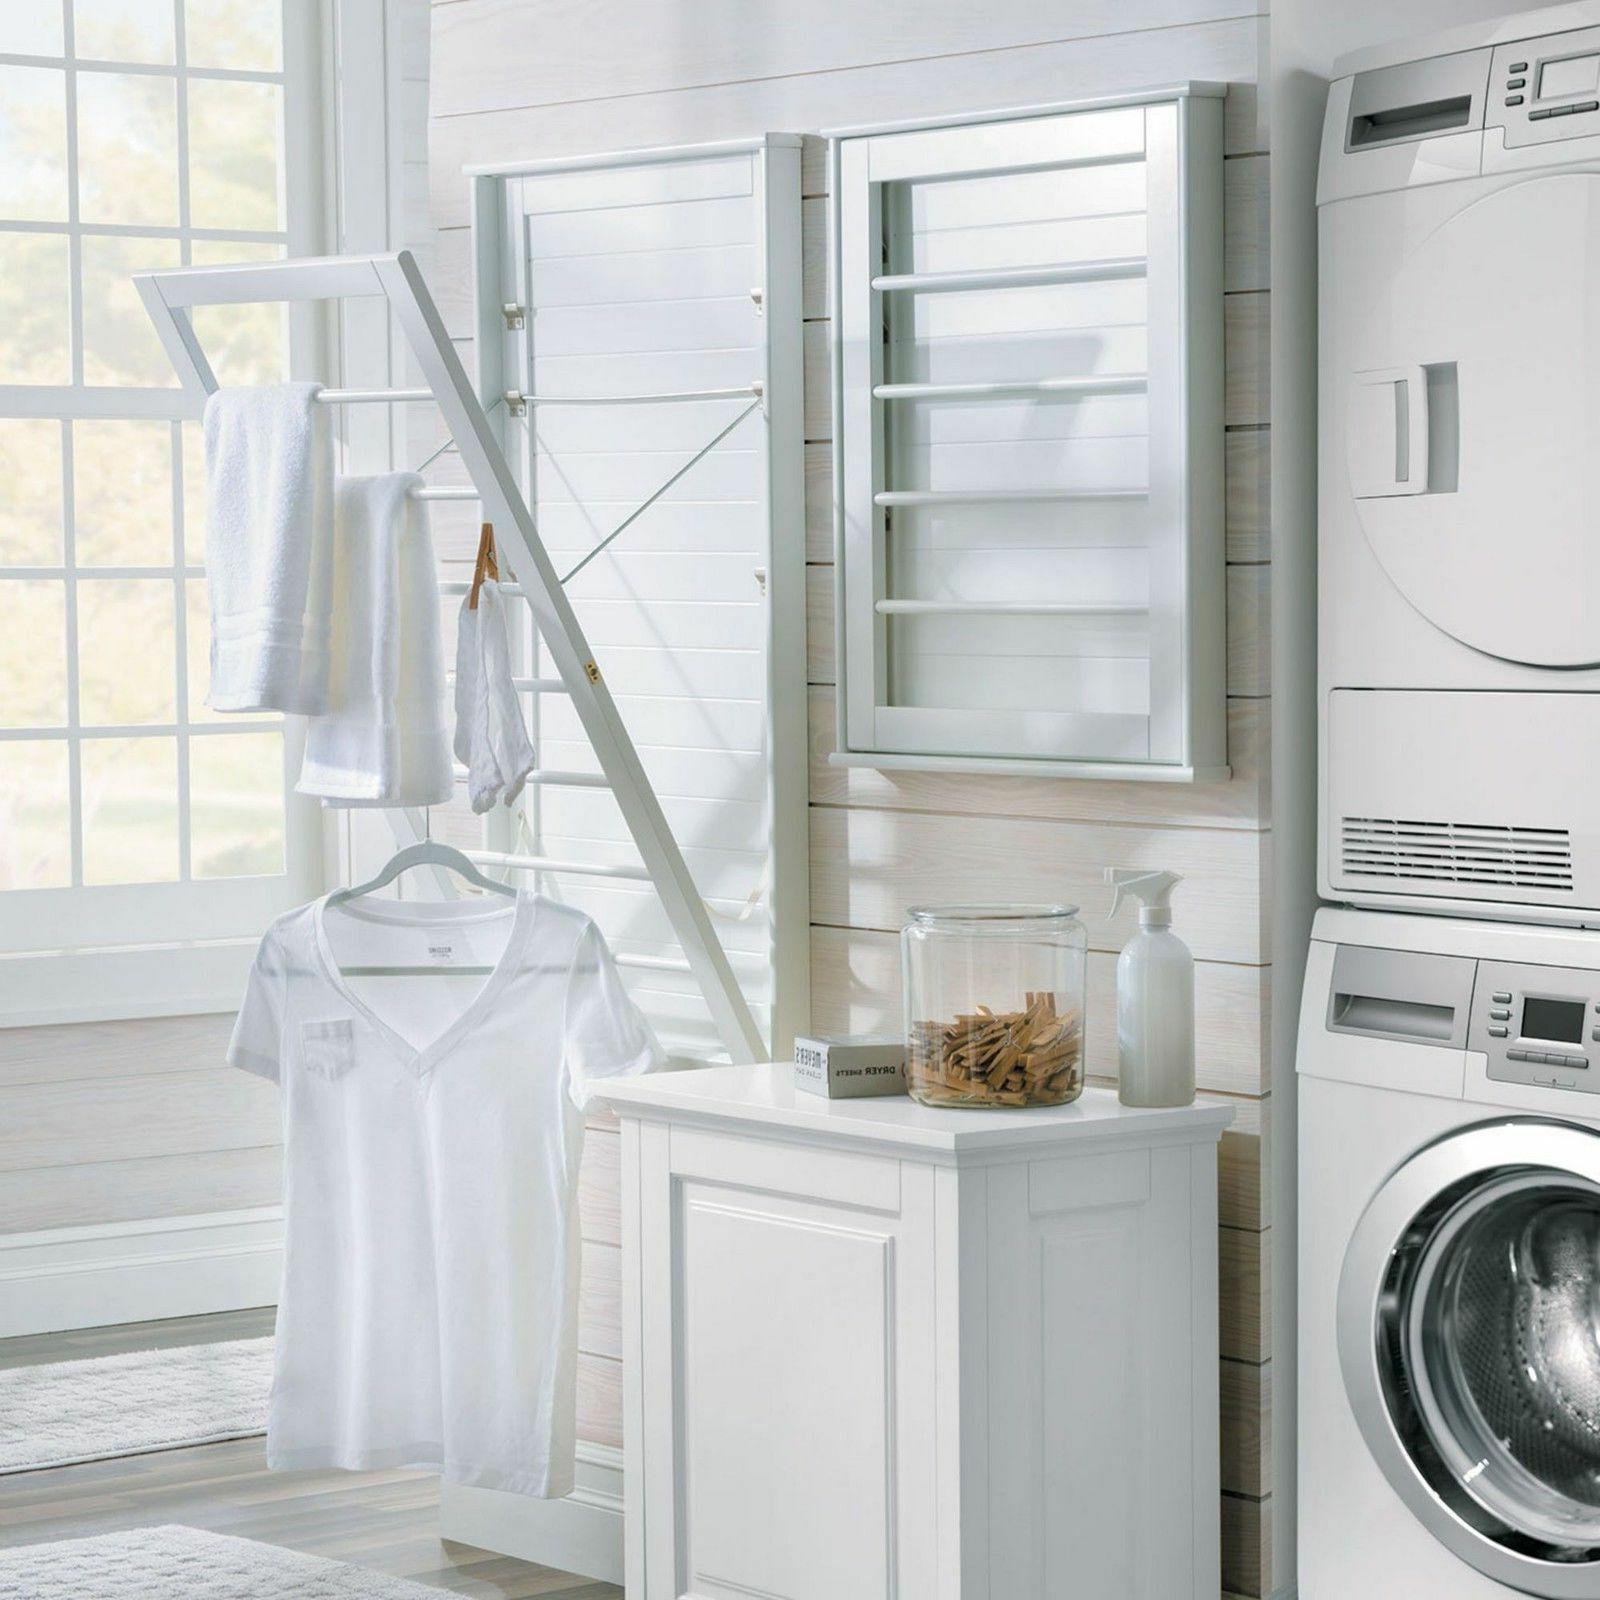 space saver clothes line large laundry folding